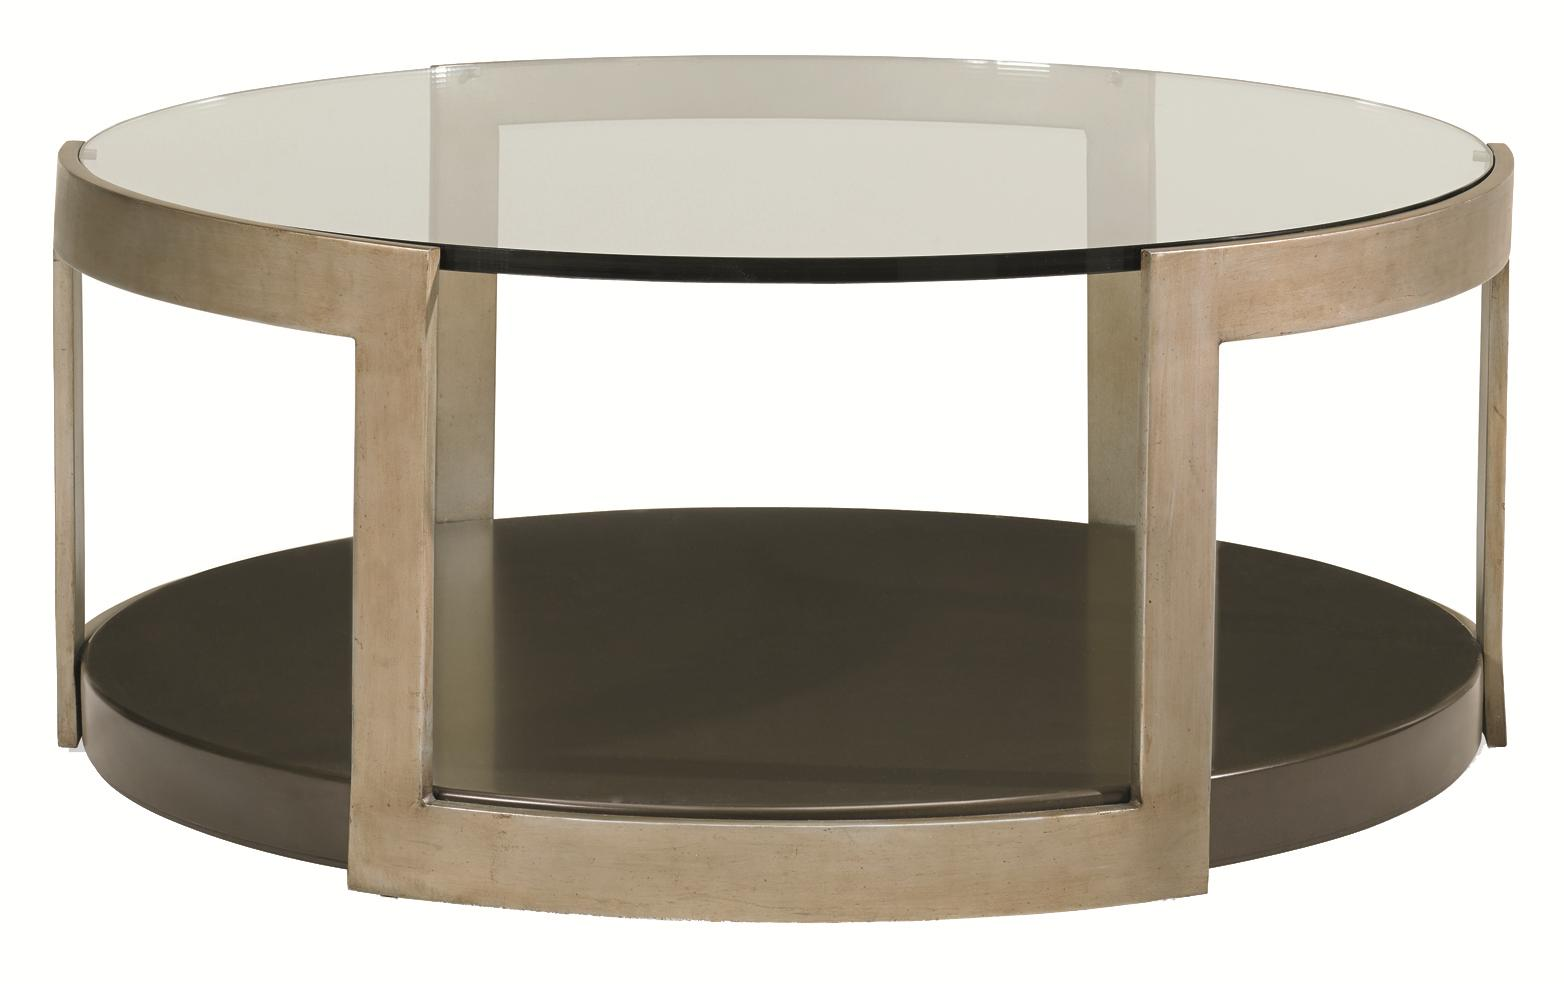 schnadig modern artisan up down and all around cocktail table jacksonville furniture mart. Black Bedroom Furniture Sets. Home Design Ideas